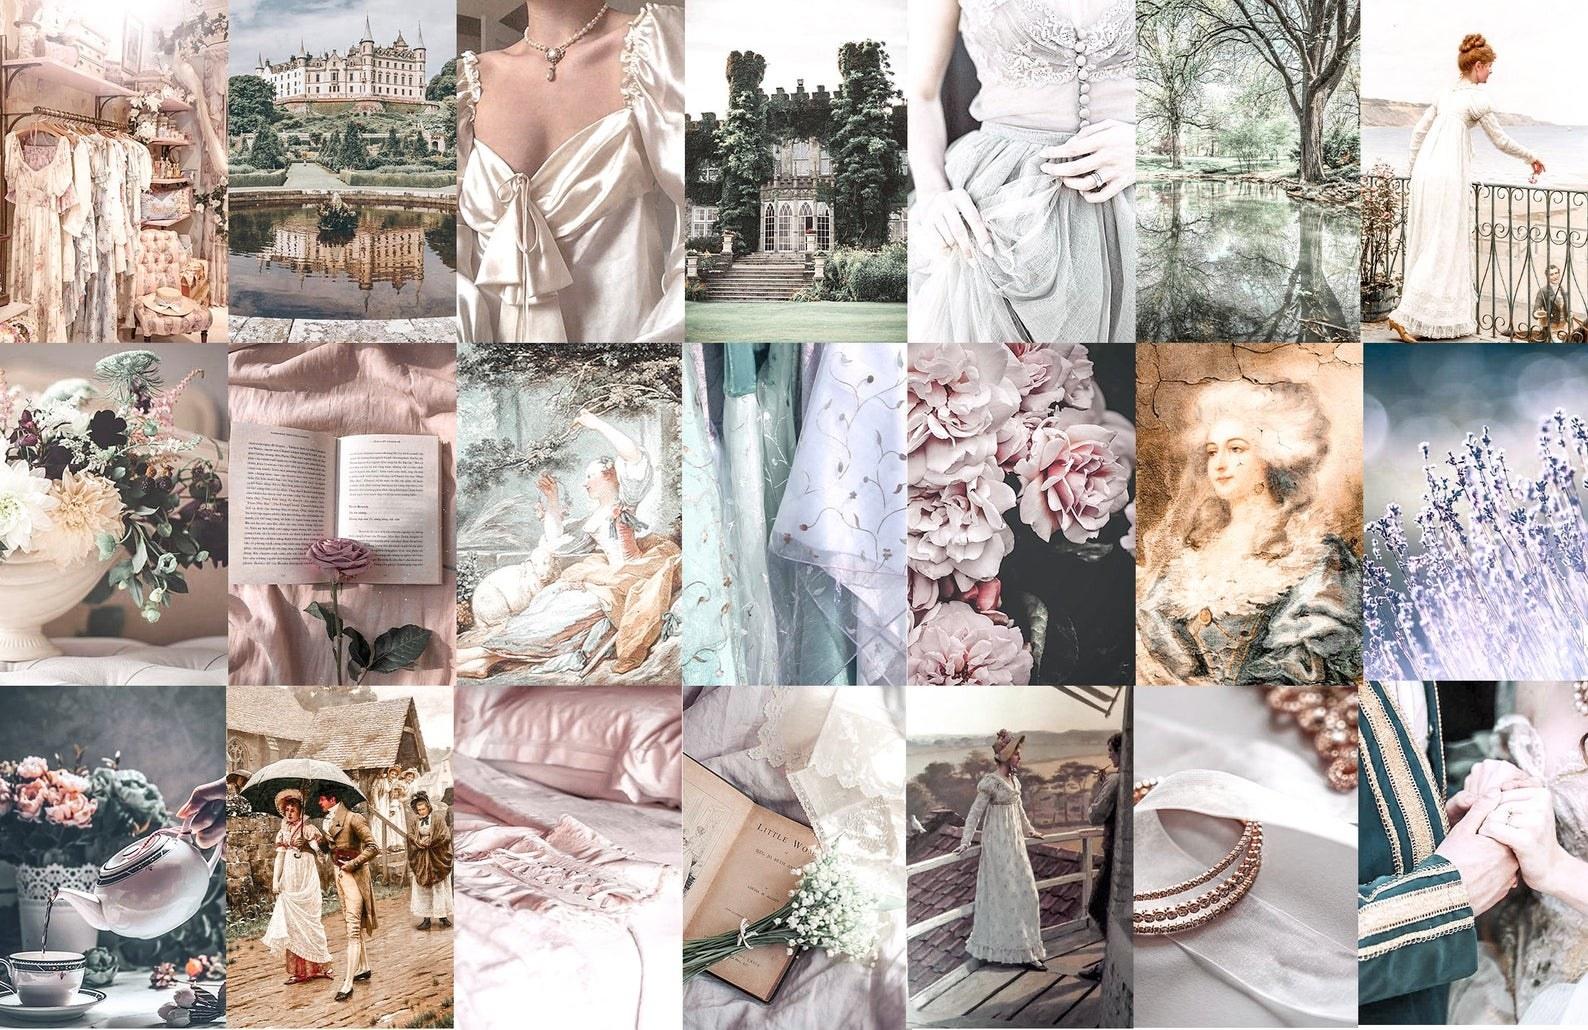 bridgerton aesthetic wall collage downloads